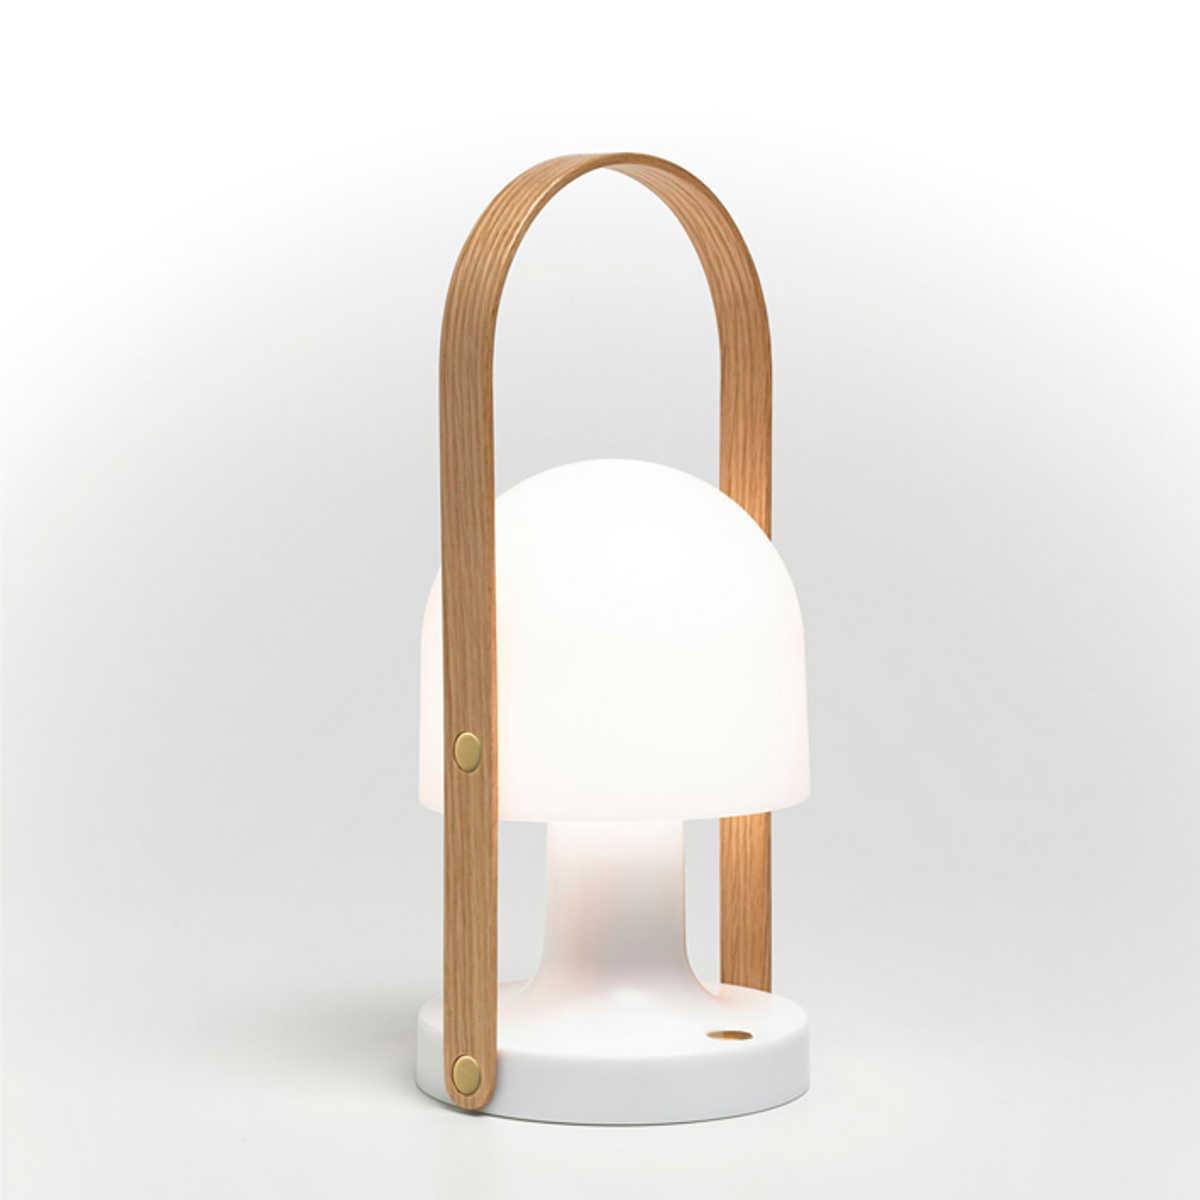 l mpara follow me marset ebanite interiorismo y decoracion. Black Bedroom Furniture Sets. Home Design Ideas